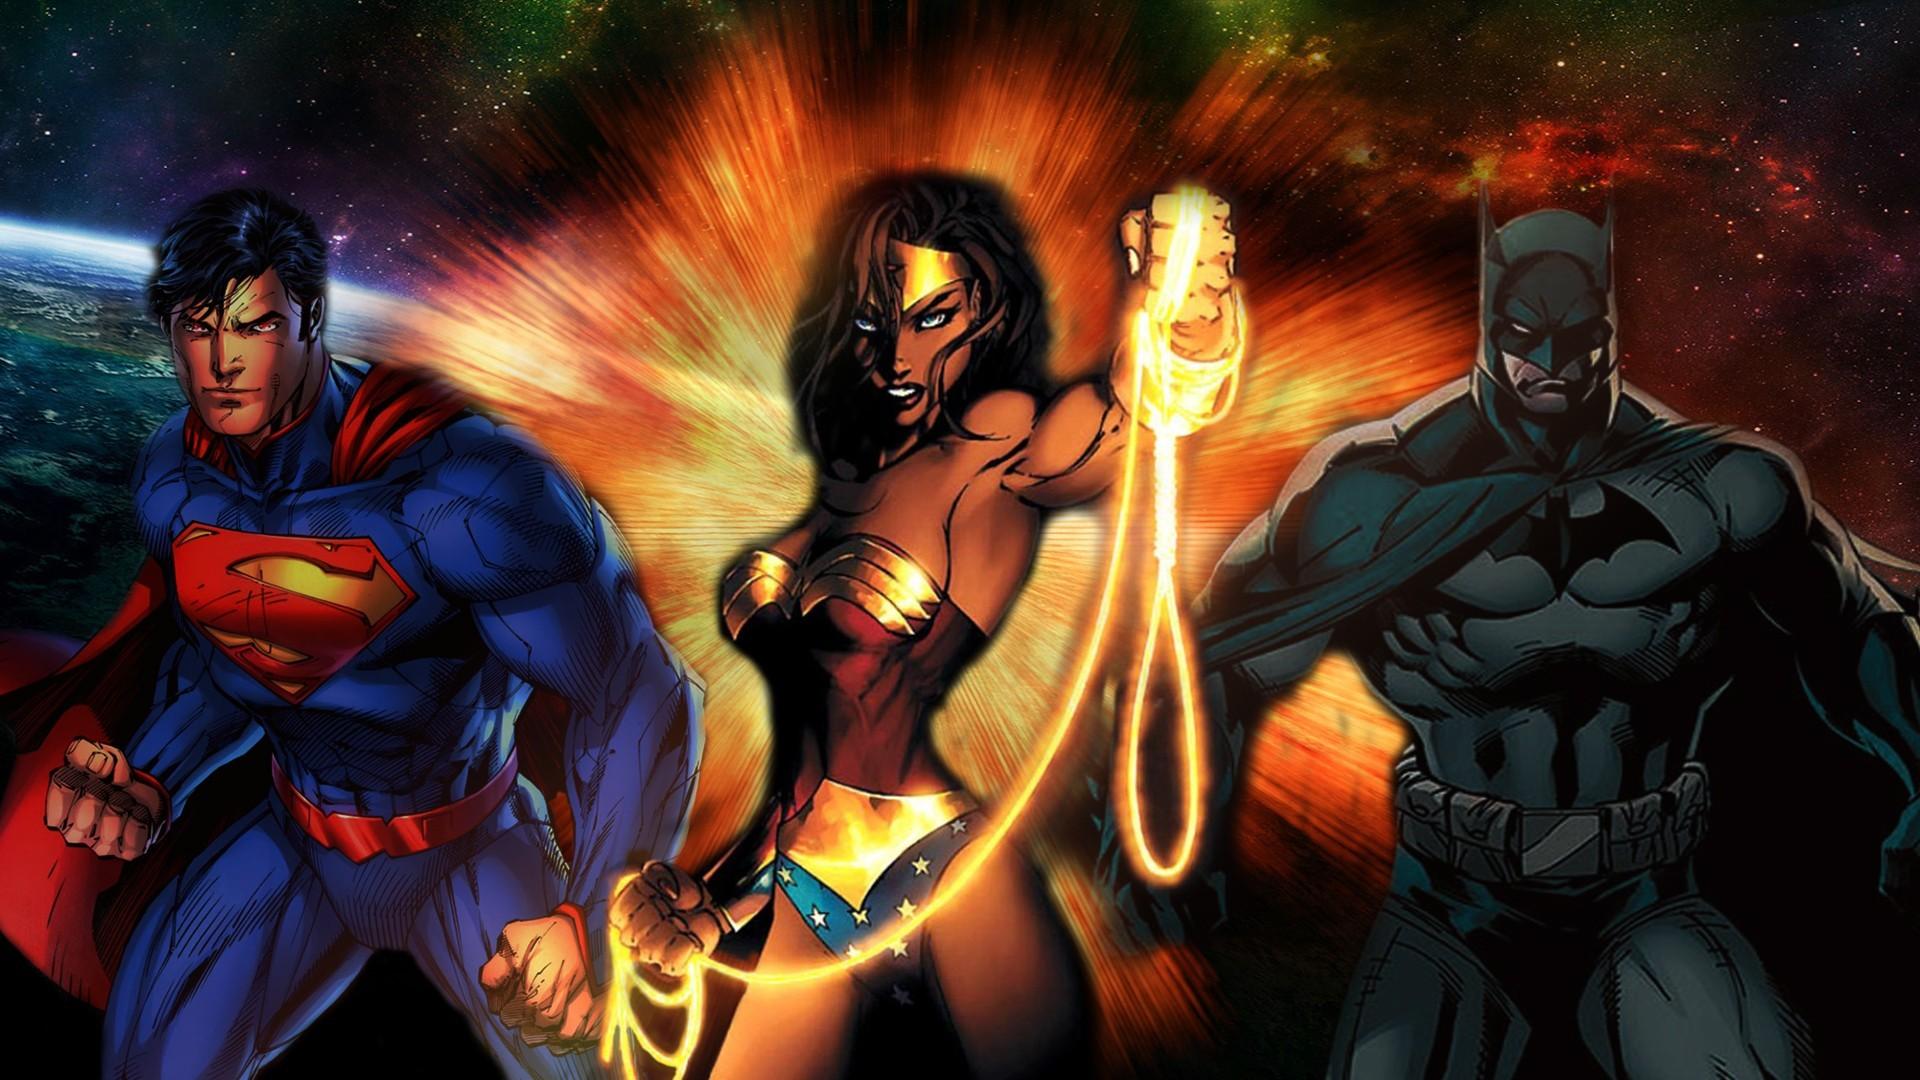 artwork batman michael turner dc comics justice league wonder woman superman